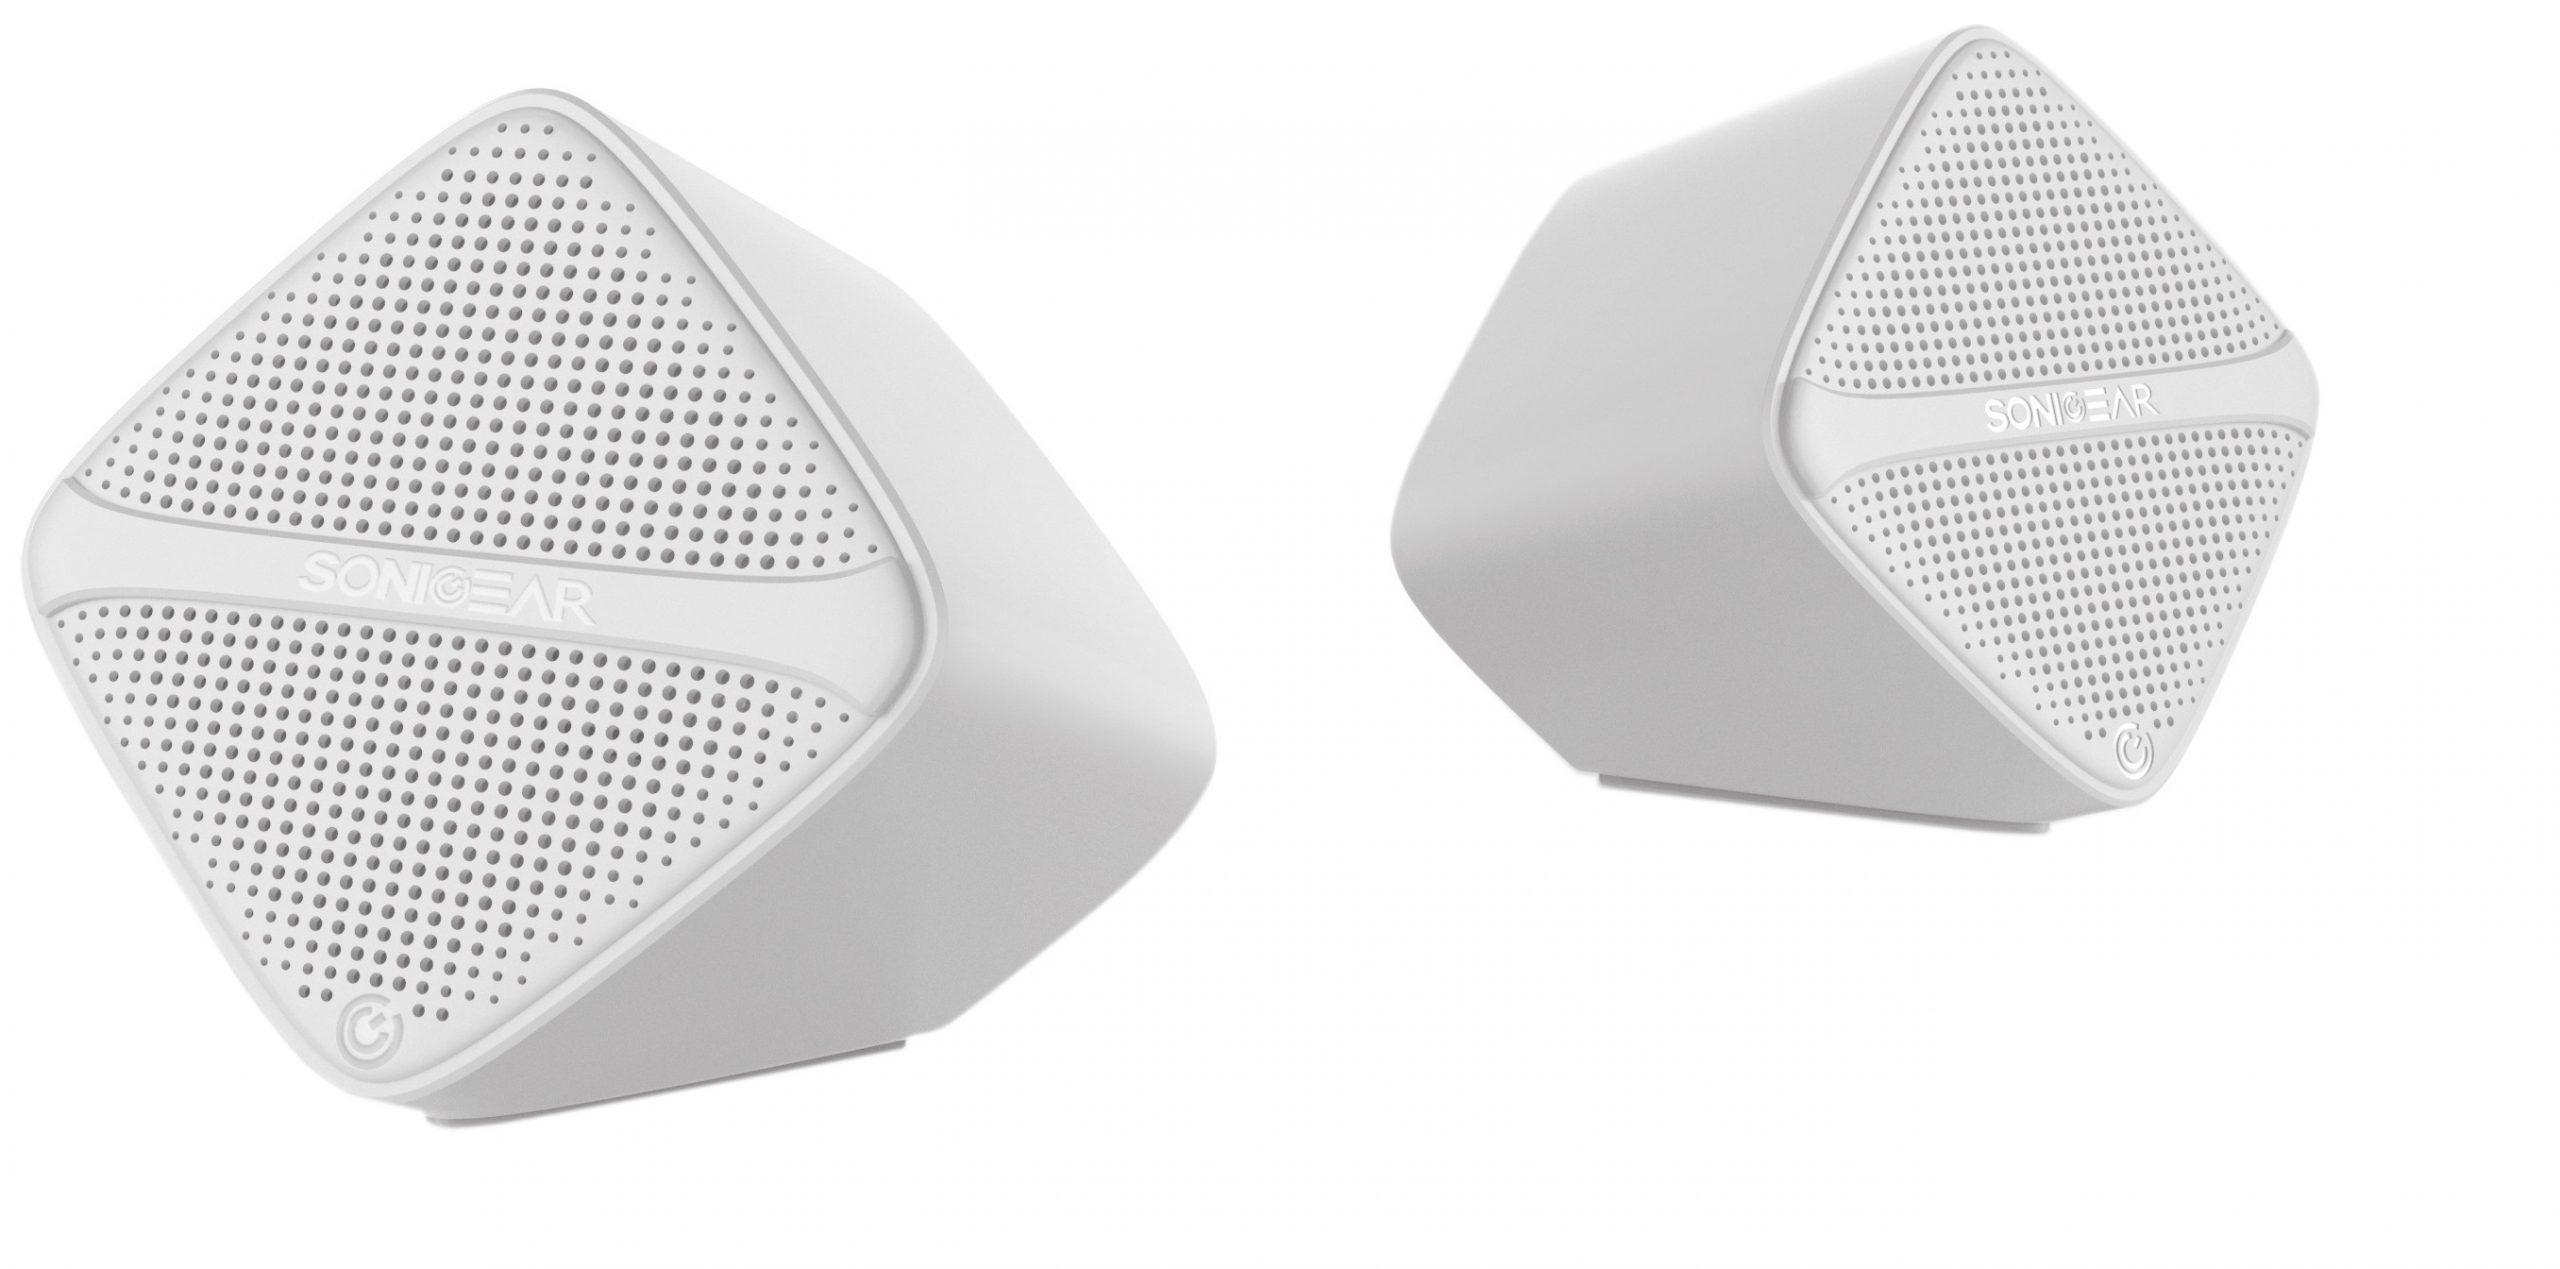 SonicGear SonicCube 2.0 USB PC Speakers White 12W